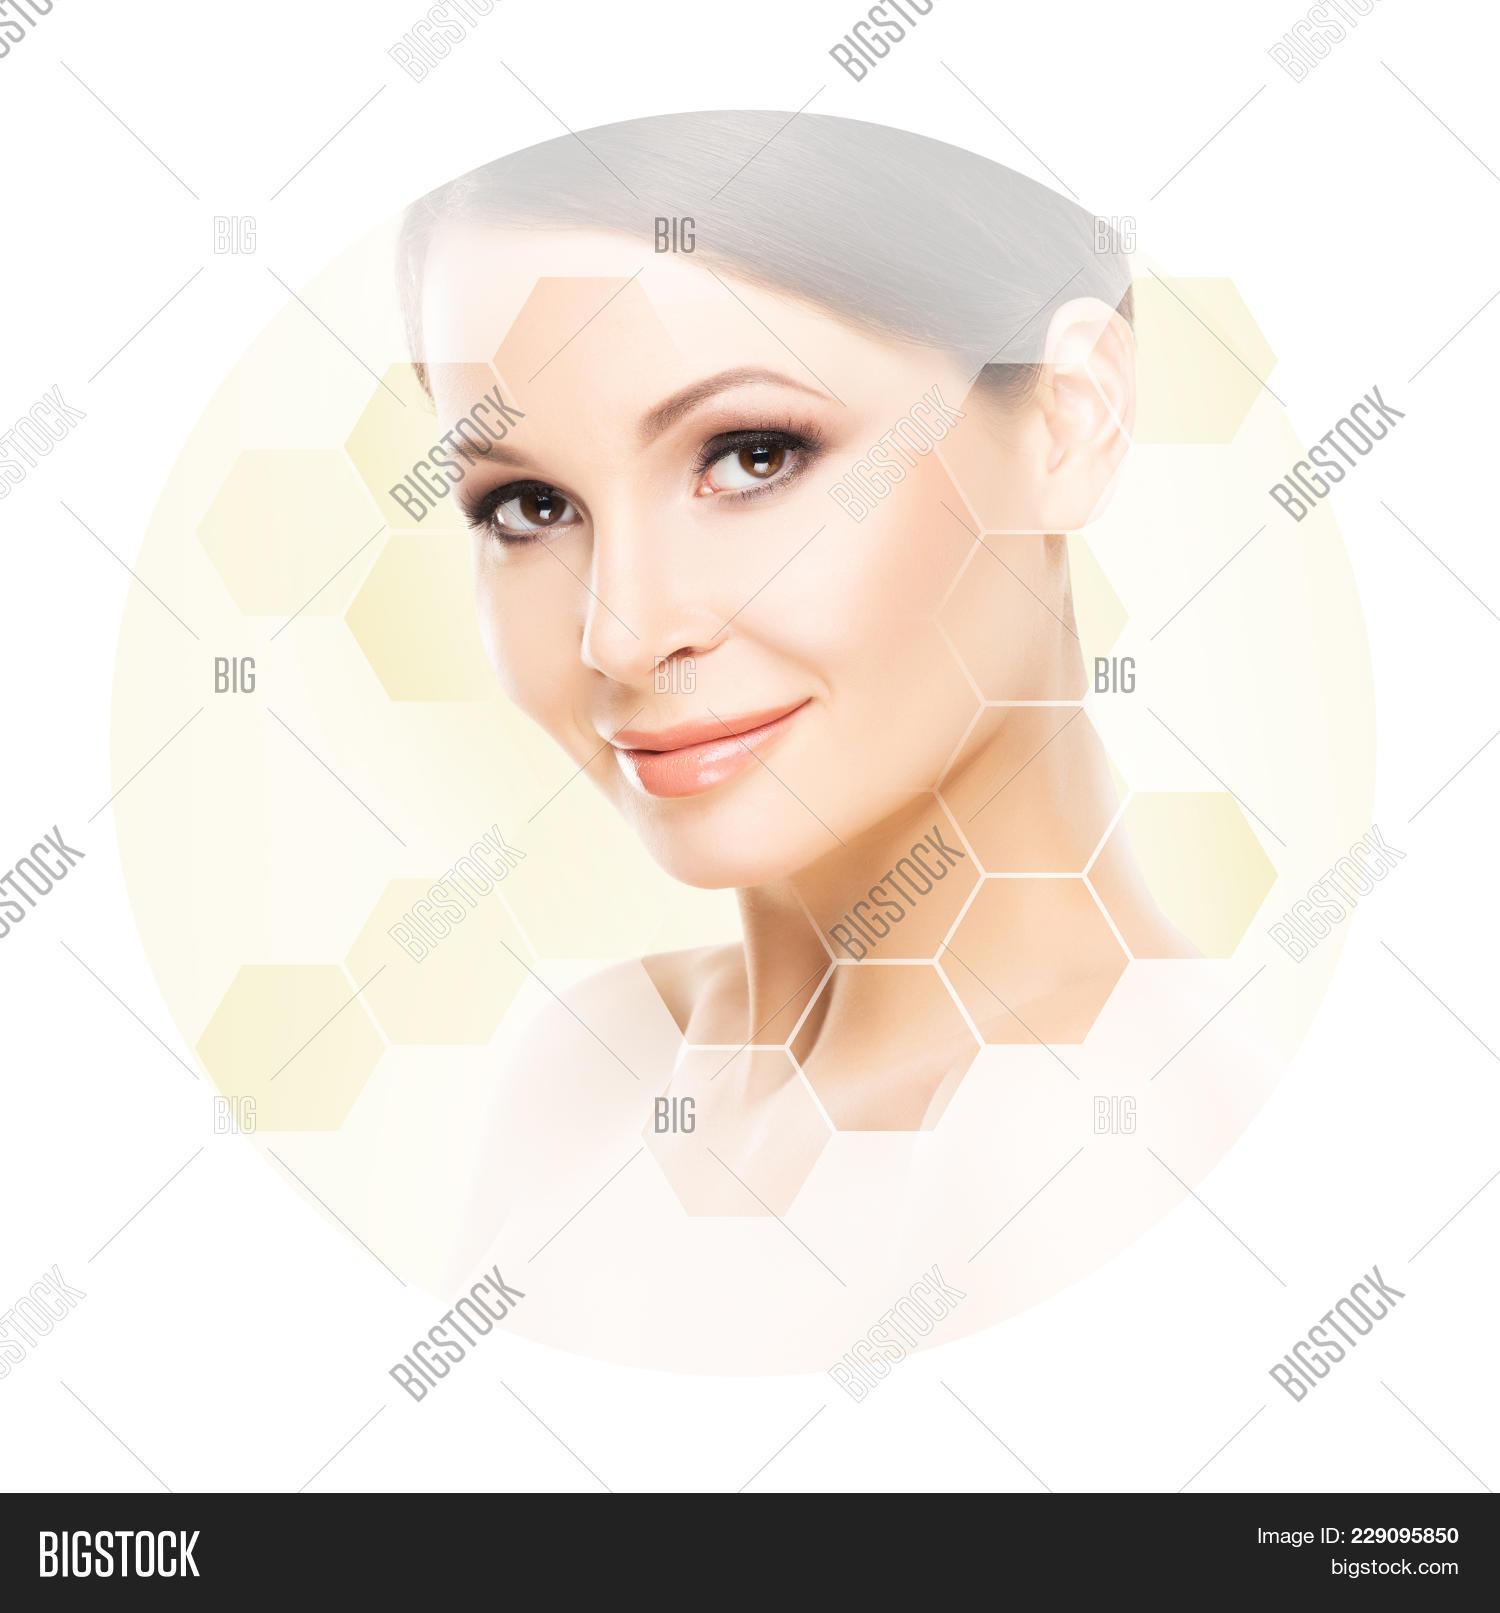 Skin plastic surgery care cosmetics powerpoint template skin y toneelgroepblik Images